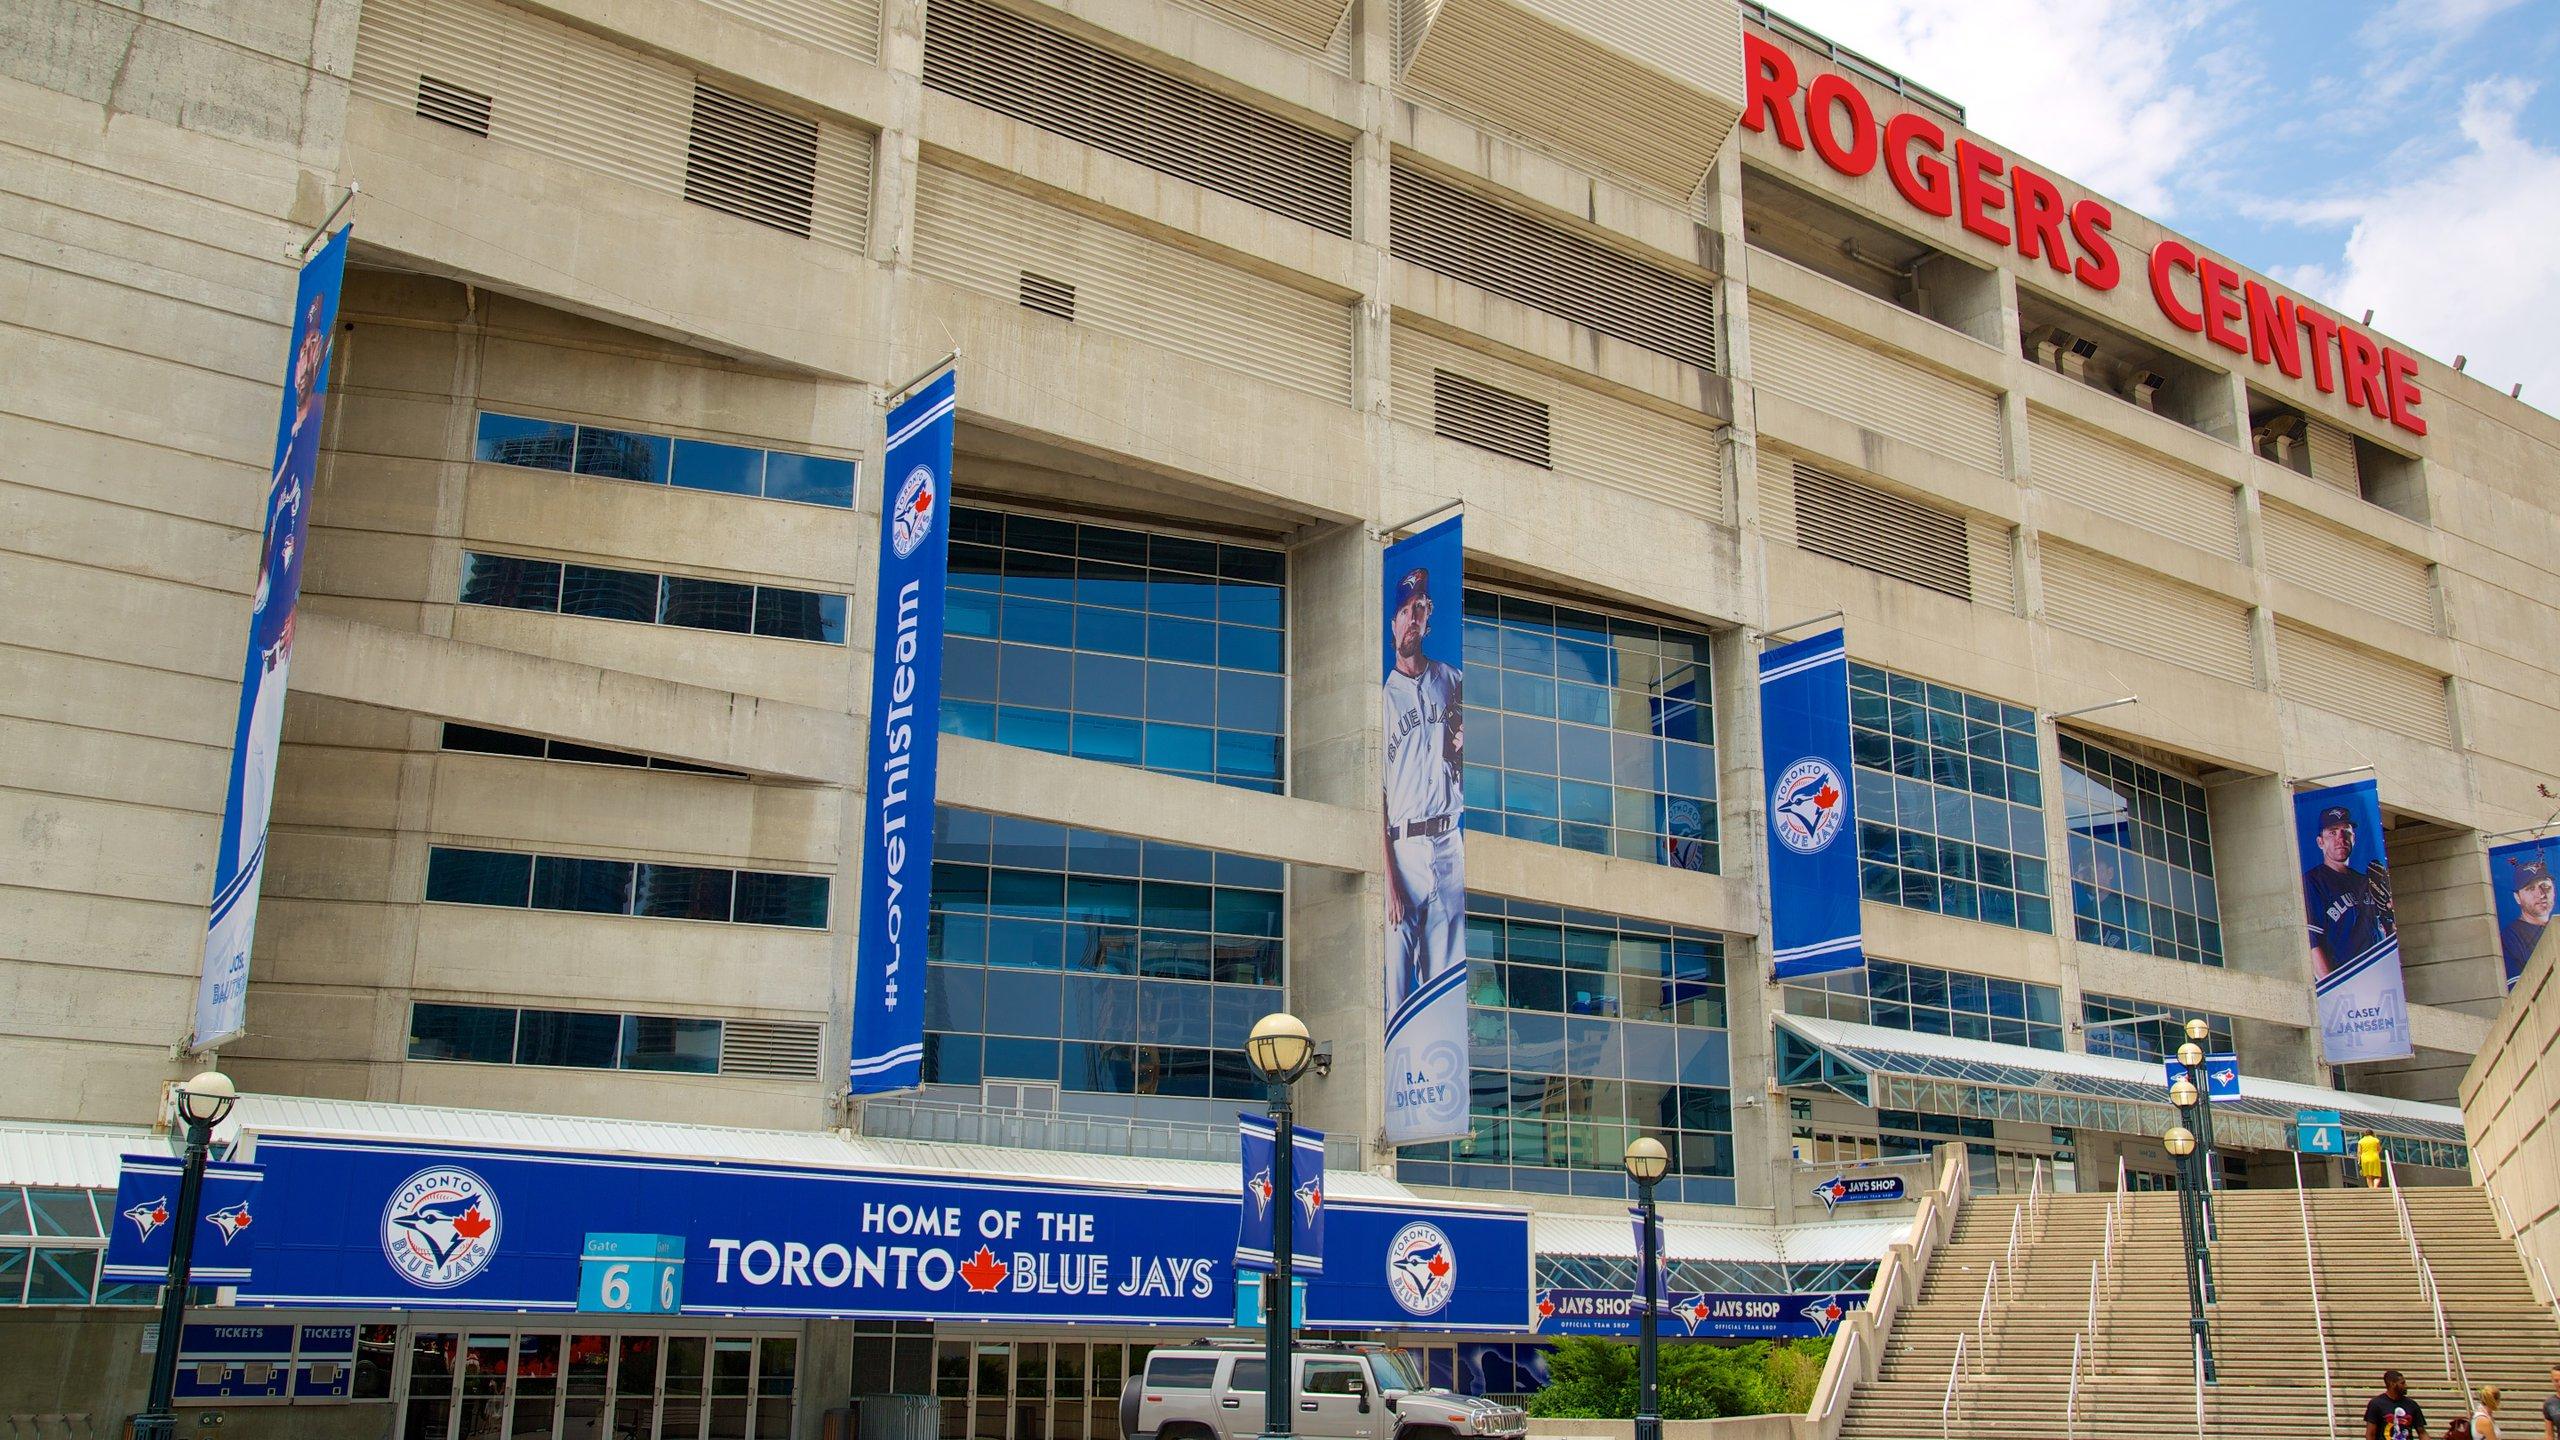 CityPlace, Toronto, Ontario, Canada